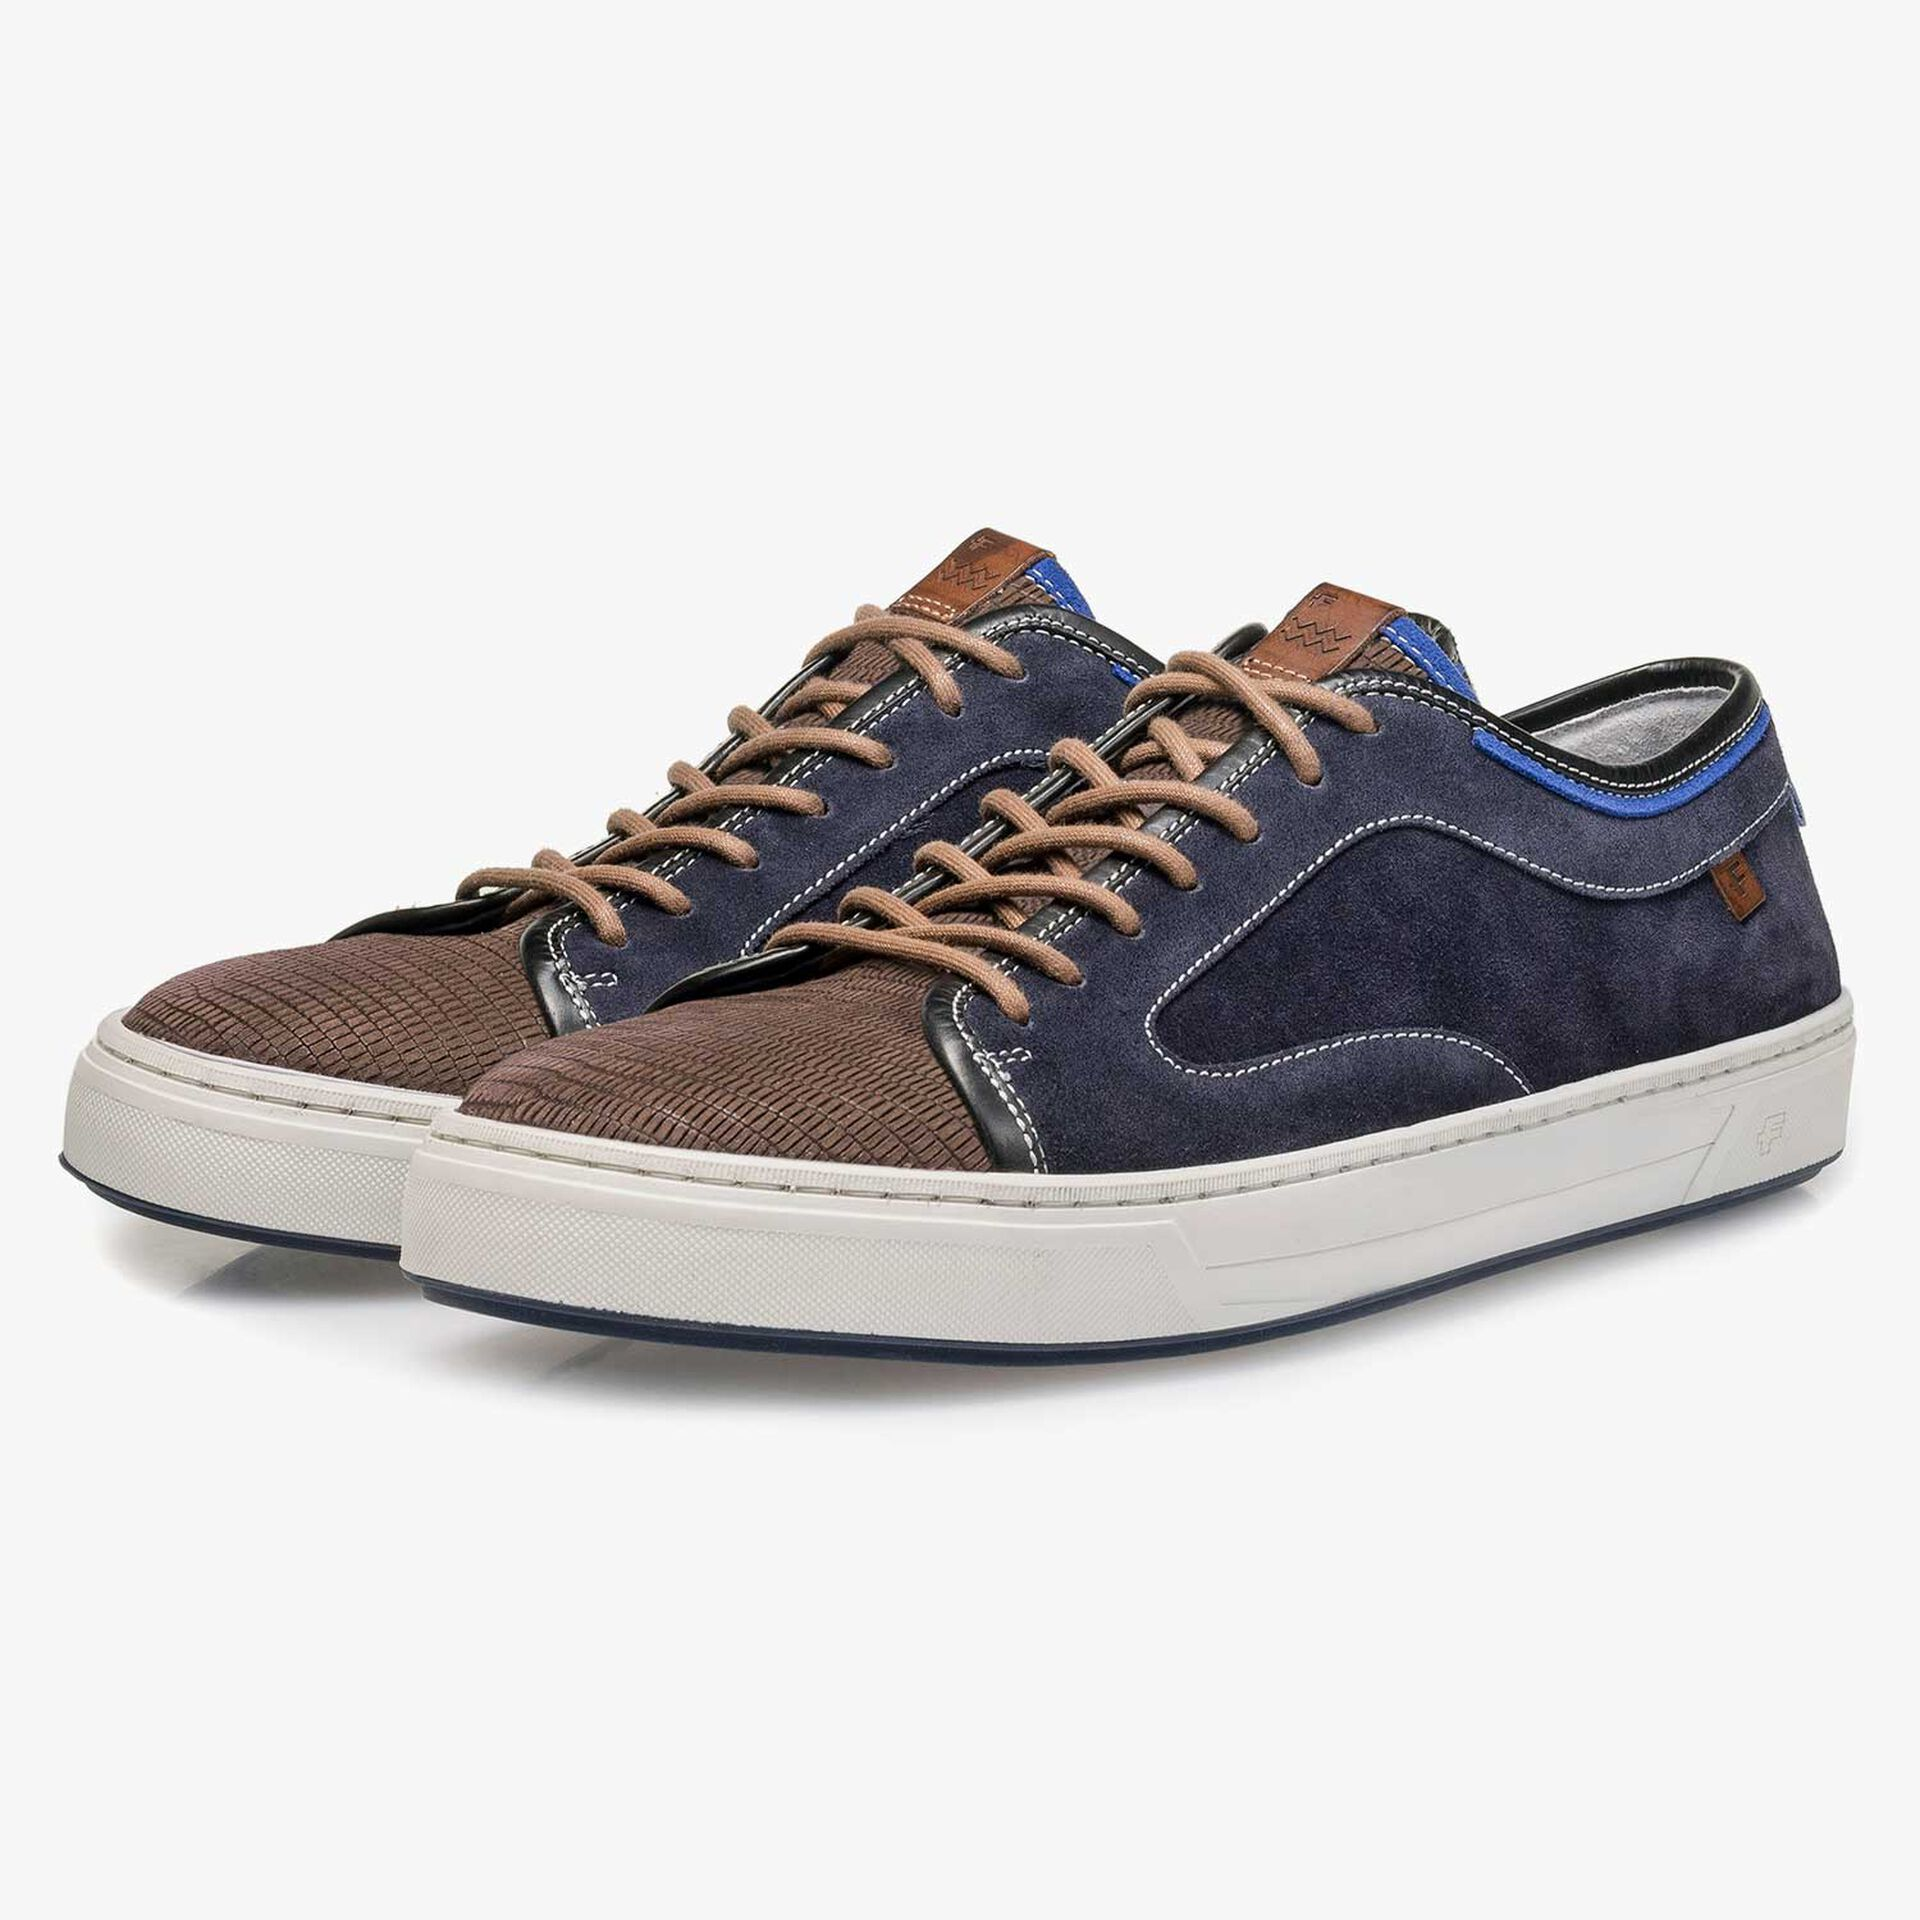 Dark blue calf suede leather sneaker with a lizard print